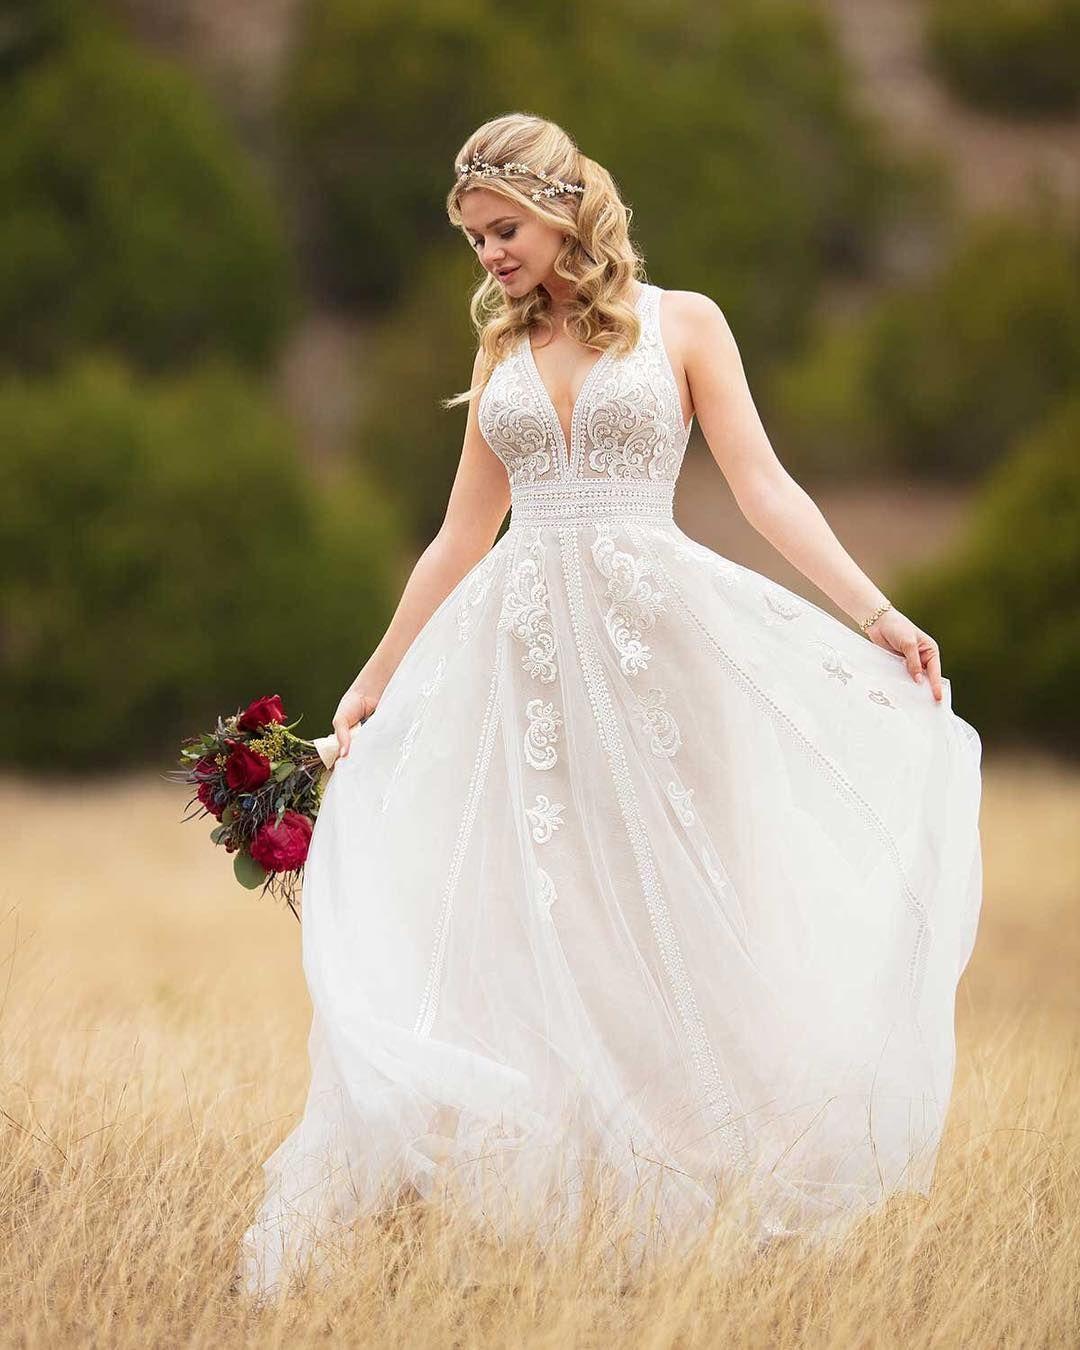 Boho Brides, Your Wedding Dress Has Arrived